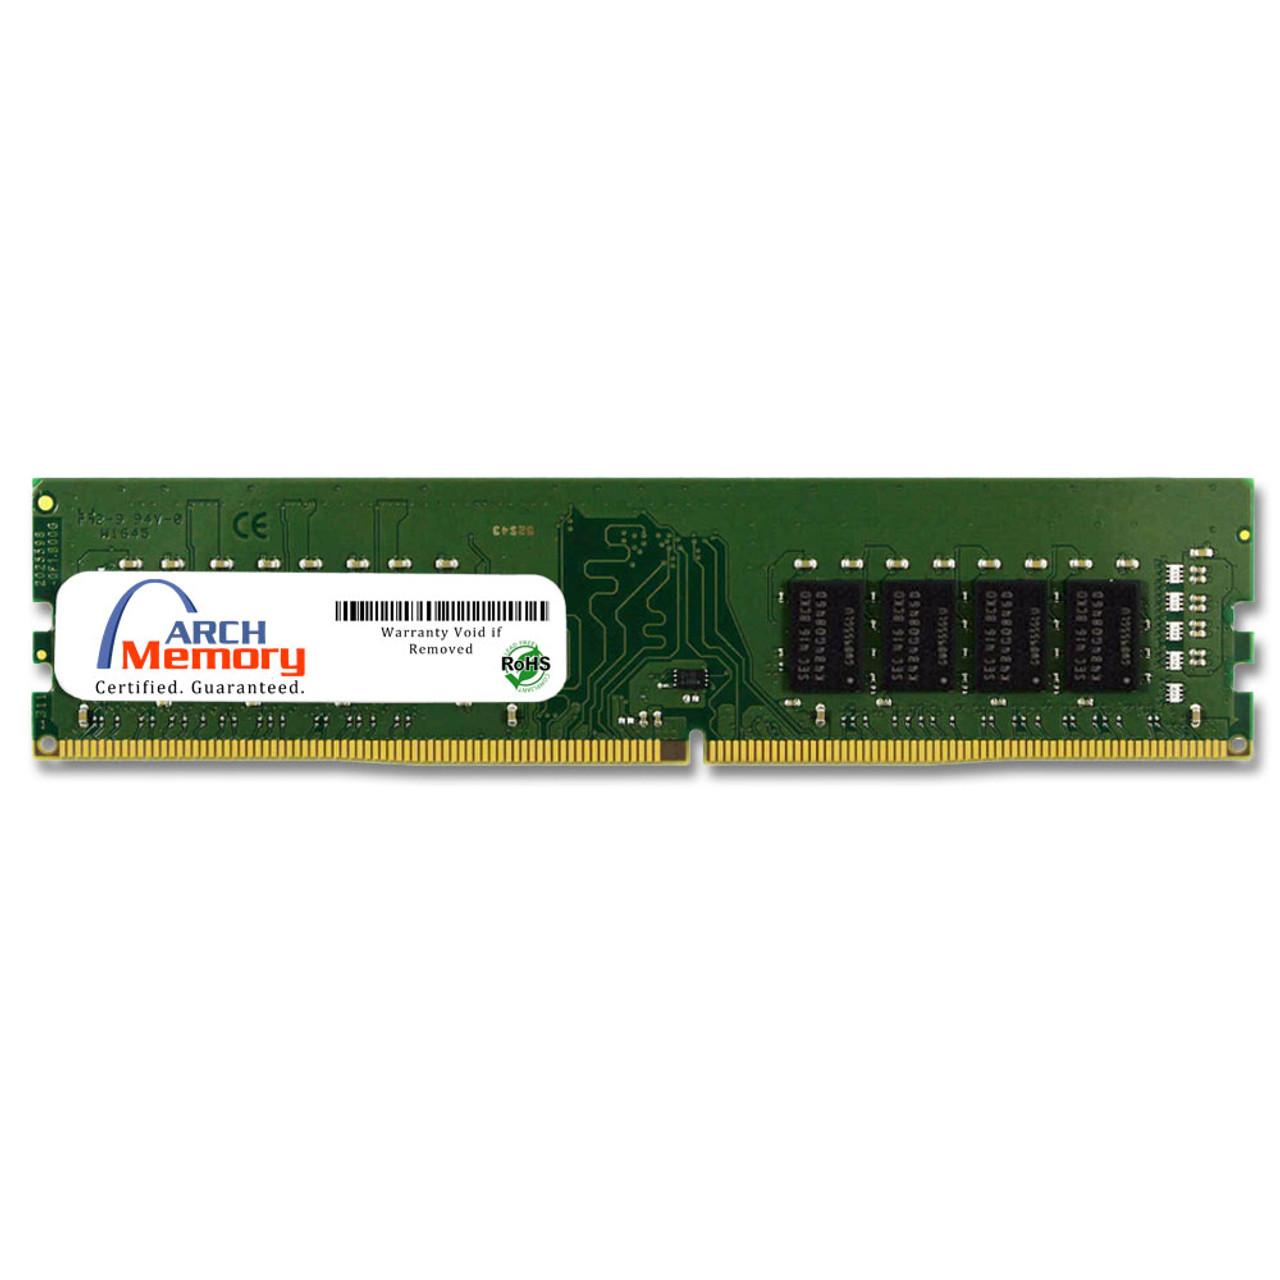 16GB DDR4-2400 PC4-19200 288 Pin Desktop RAM Memory